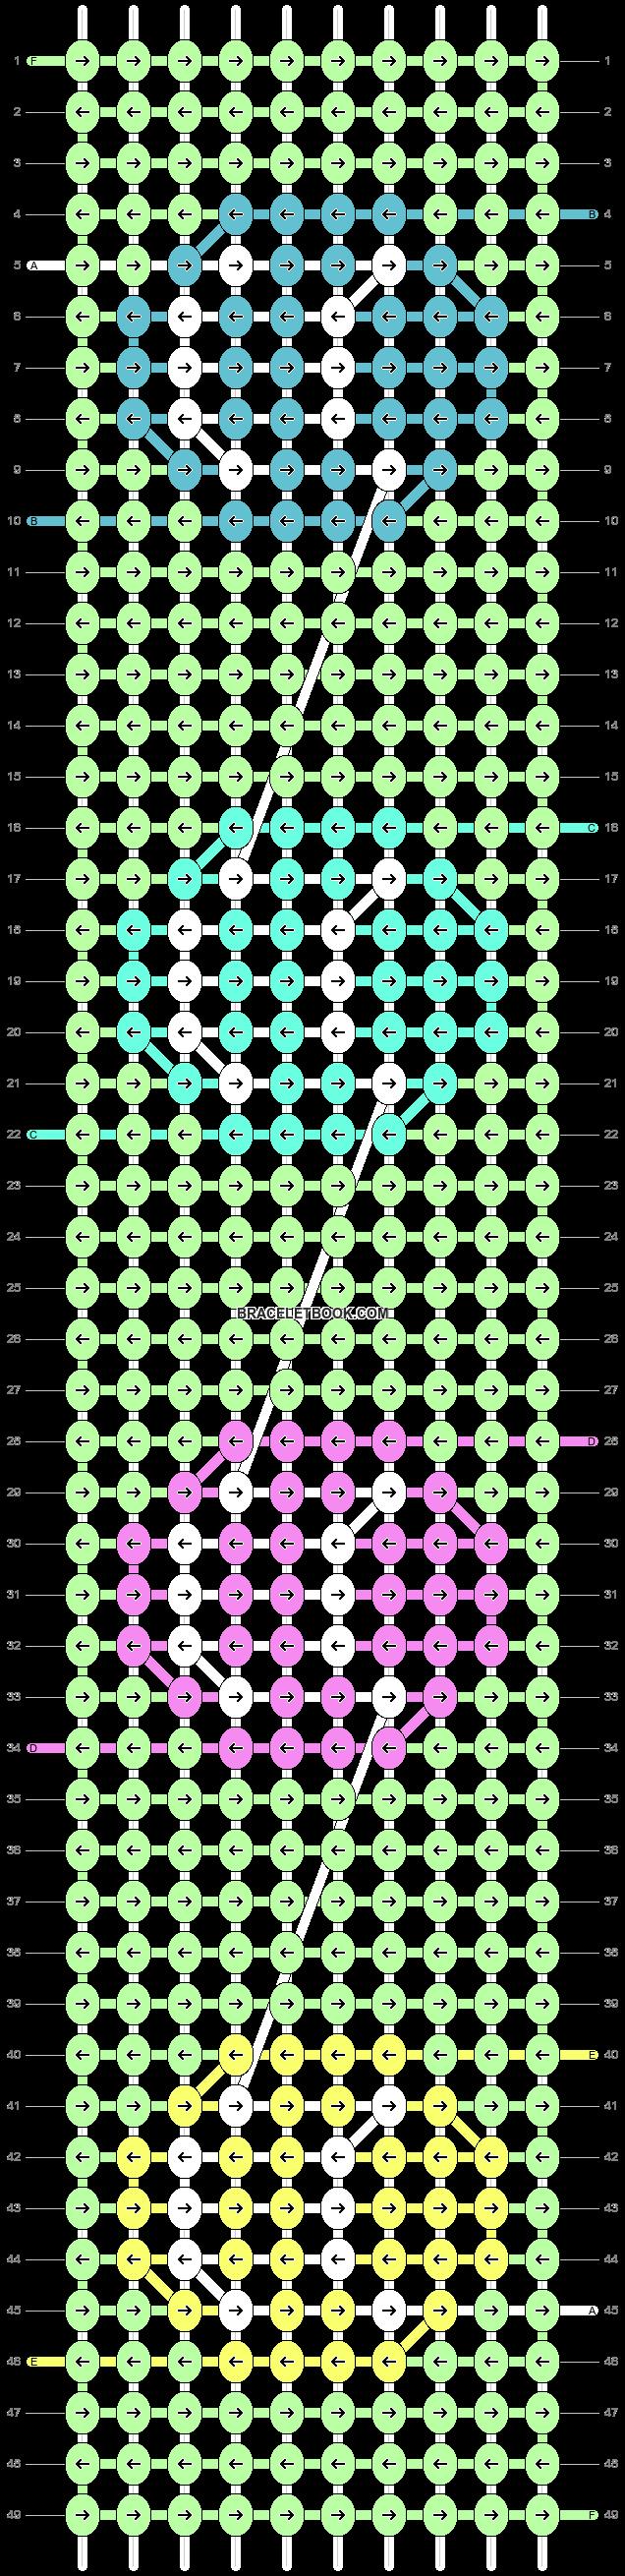 Alpha pattern #84518 variation #152995 pattern